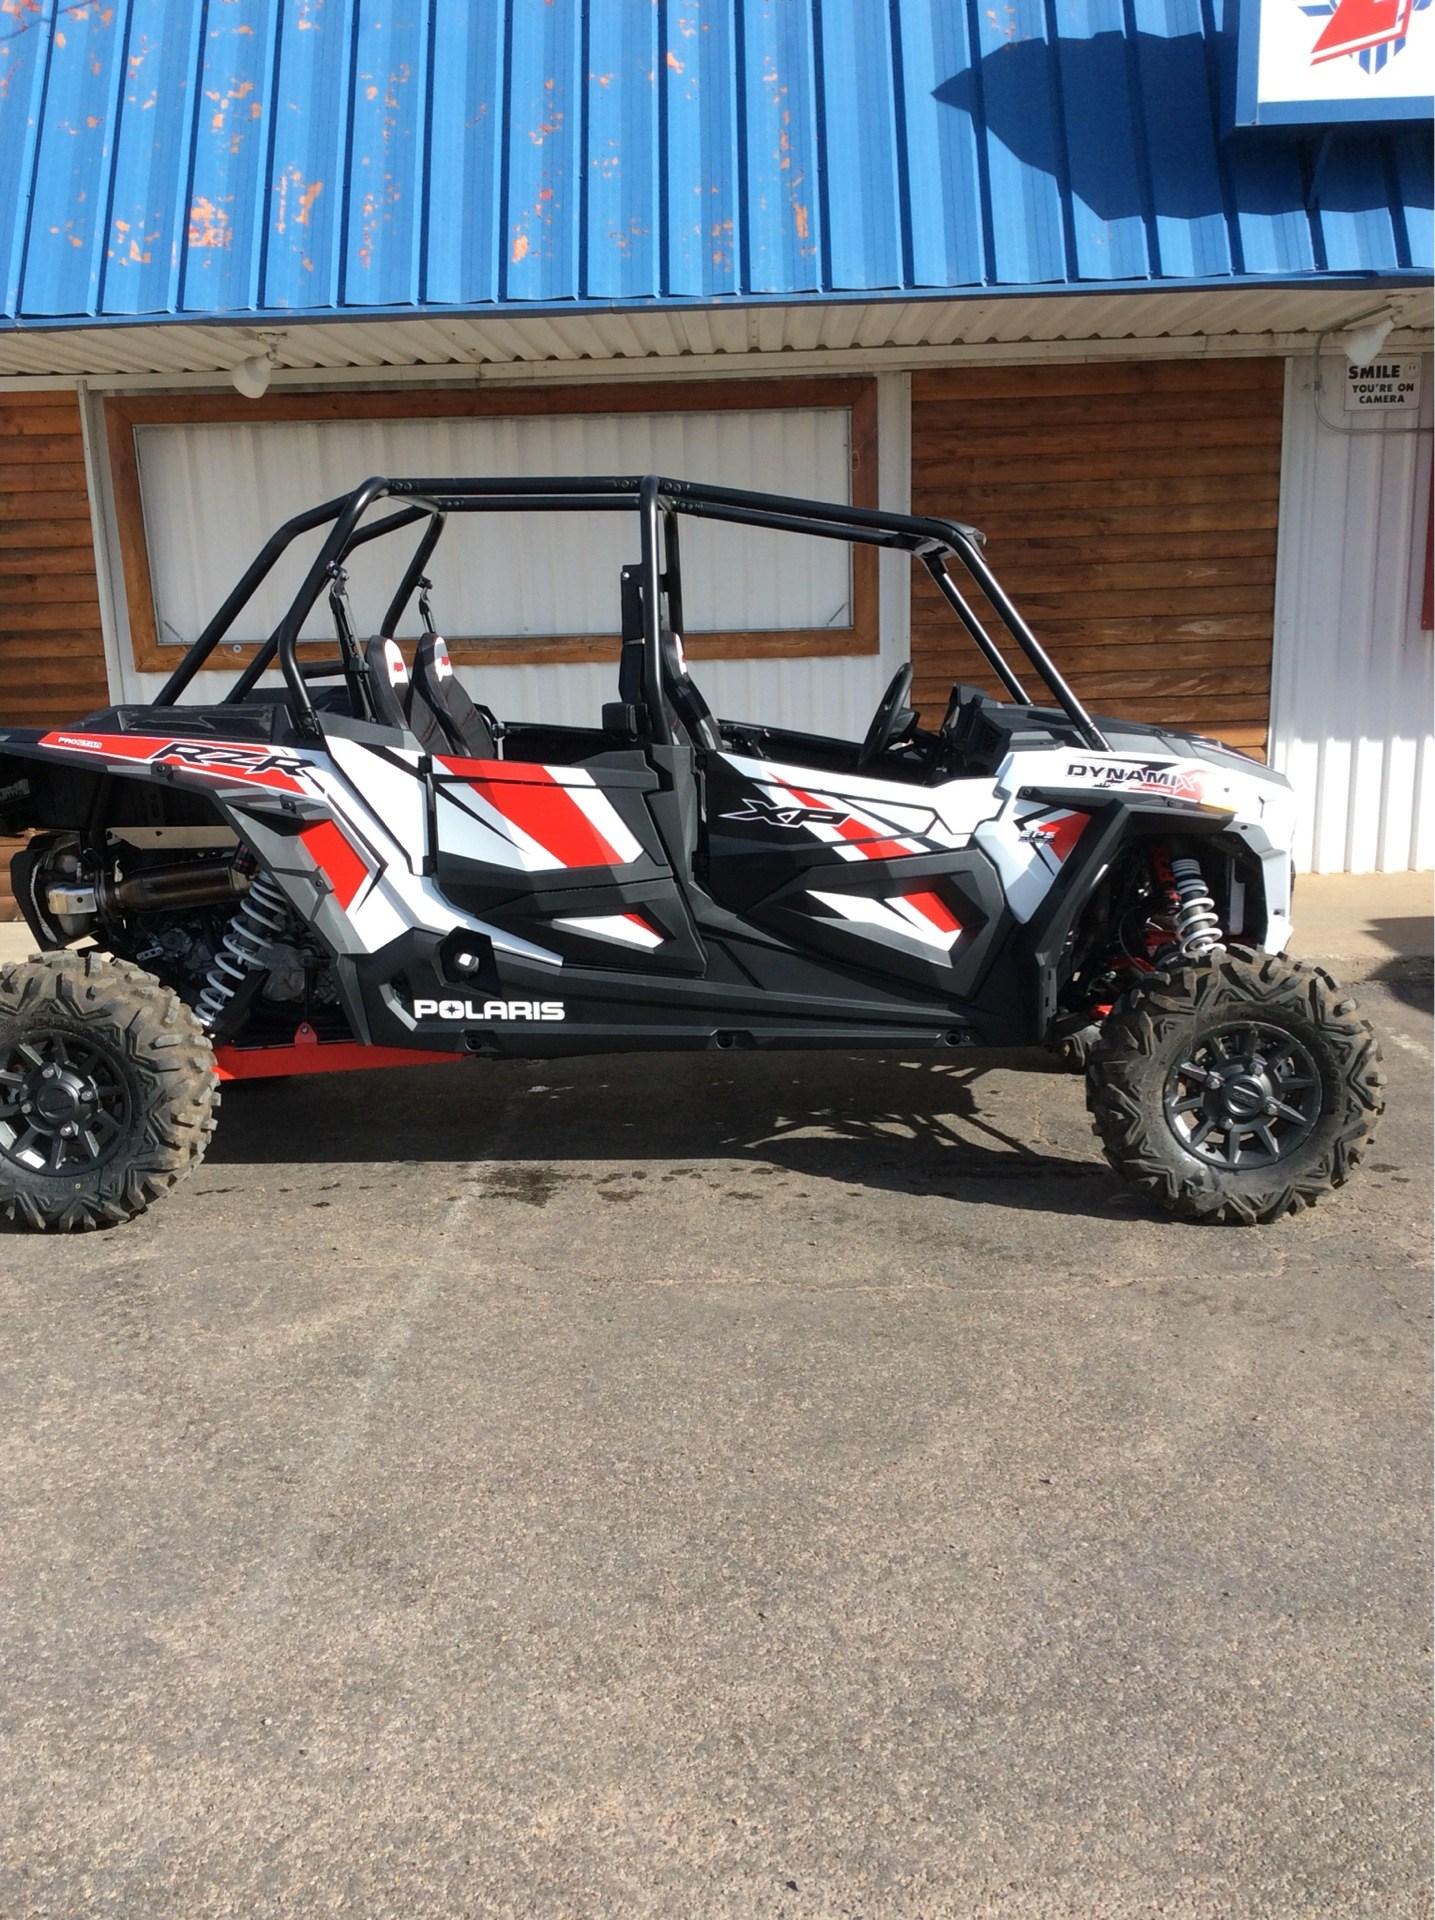 Polaris Rzr 1000 4 Seater >> 2019 Polaris Rzr Xp 4 1000 Dynamix In Clovis New Mexico